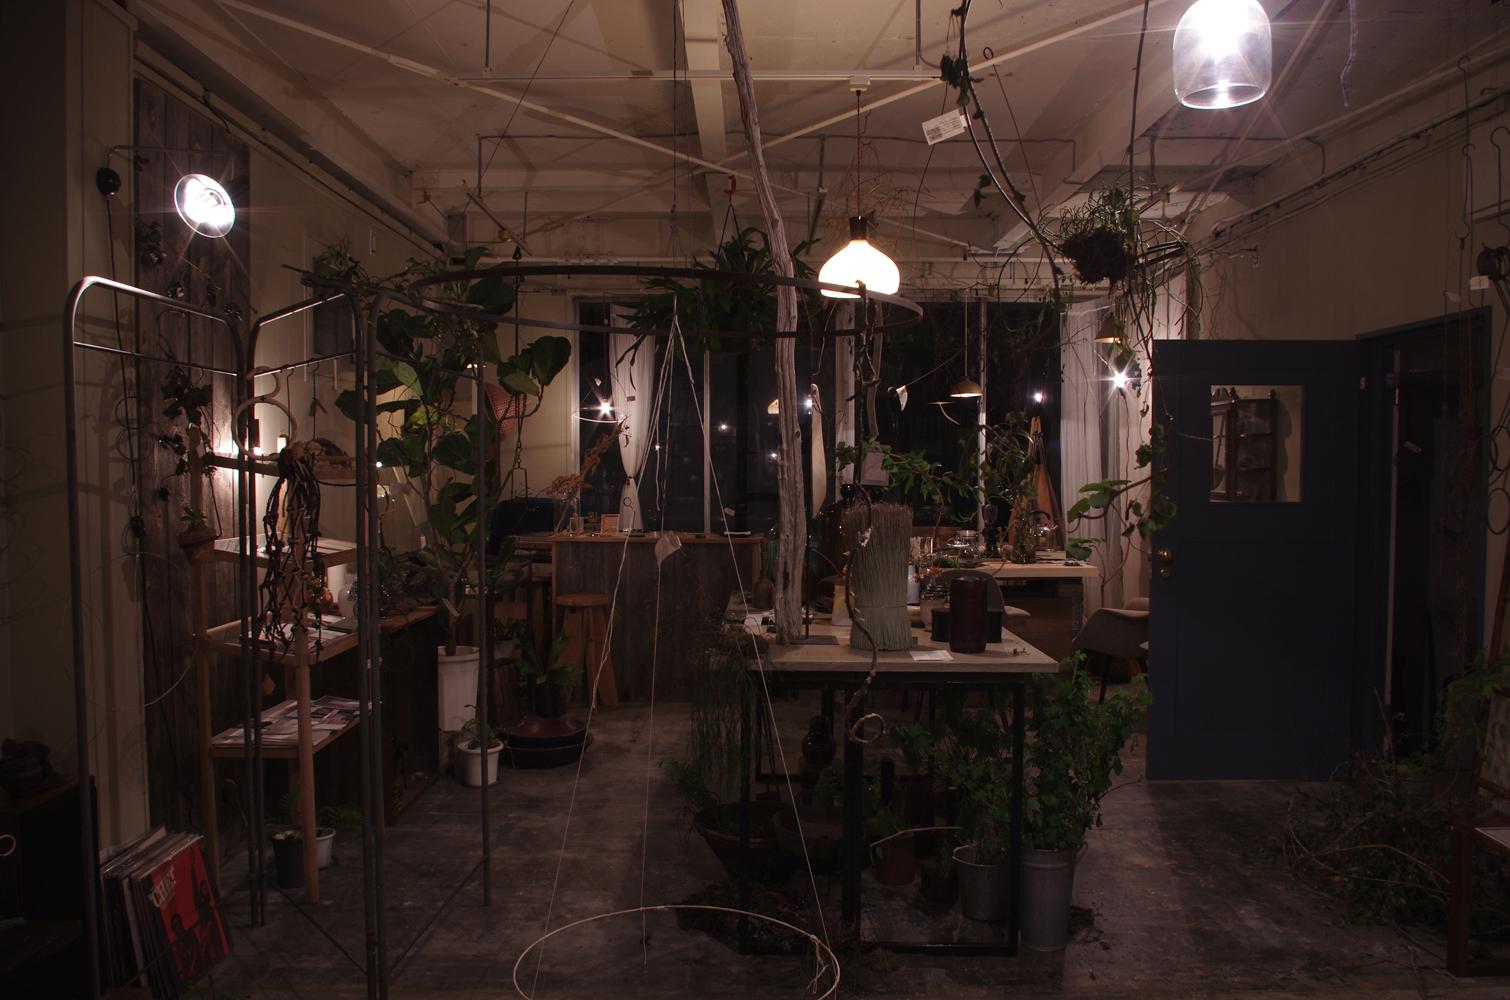 tipura-studio-ironworks-exhibition-10